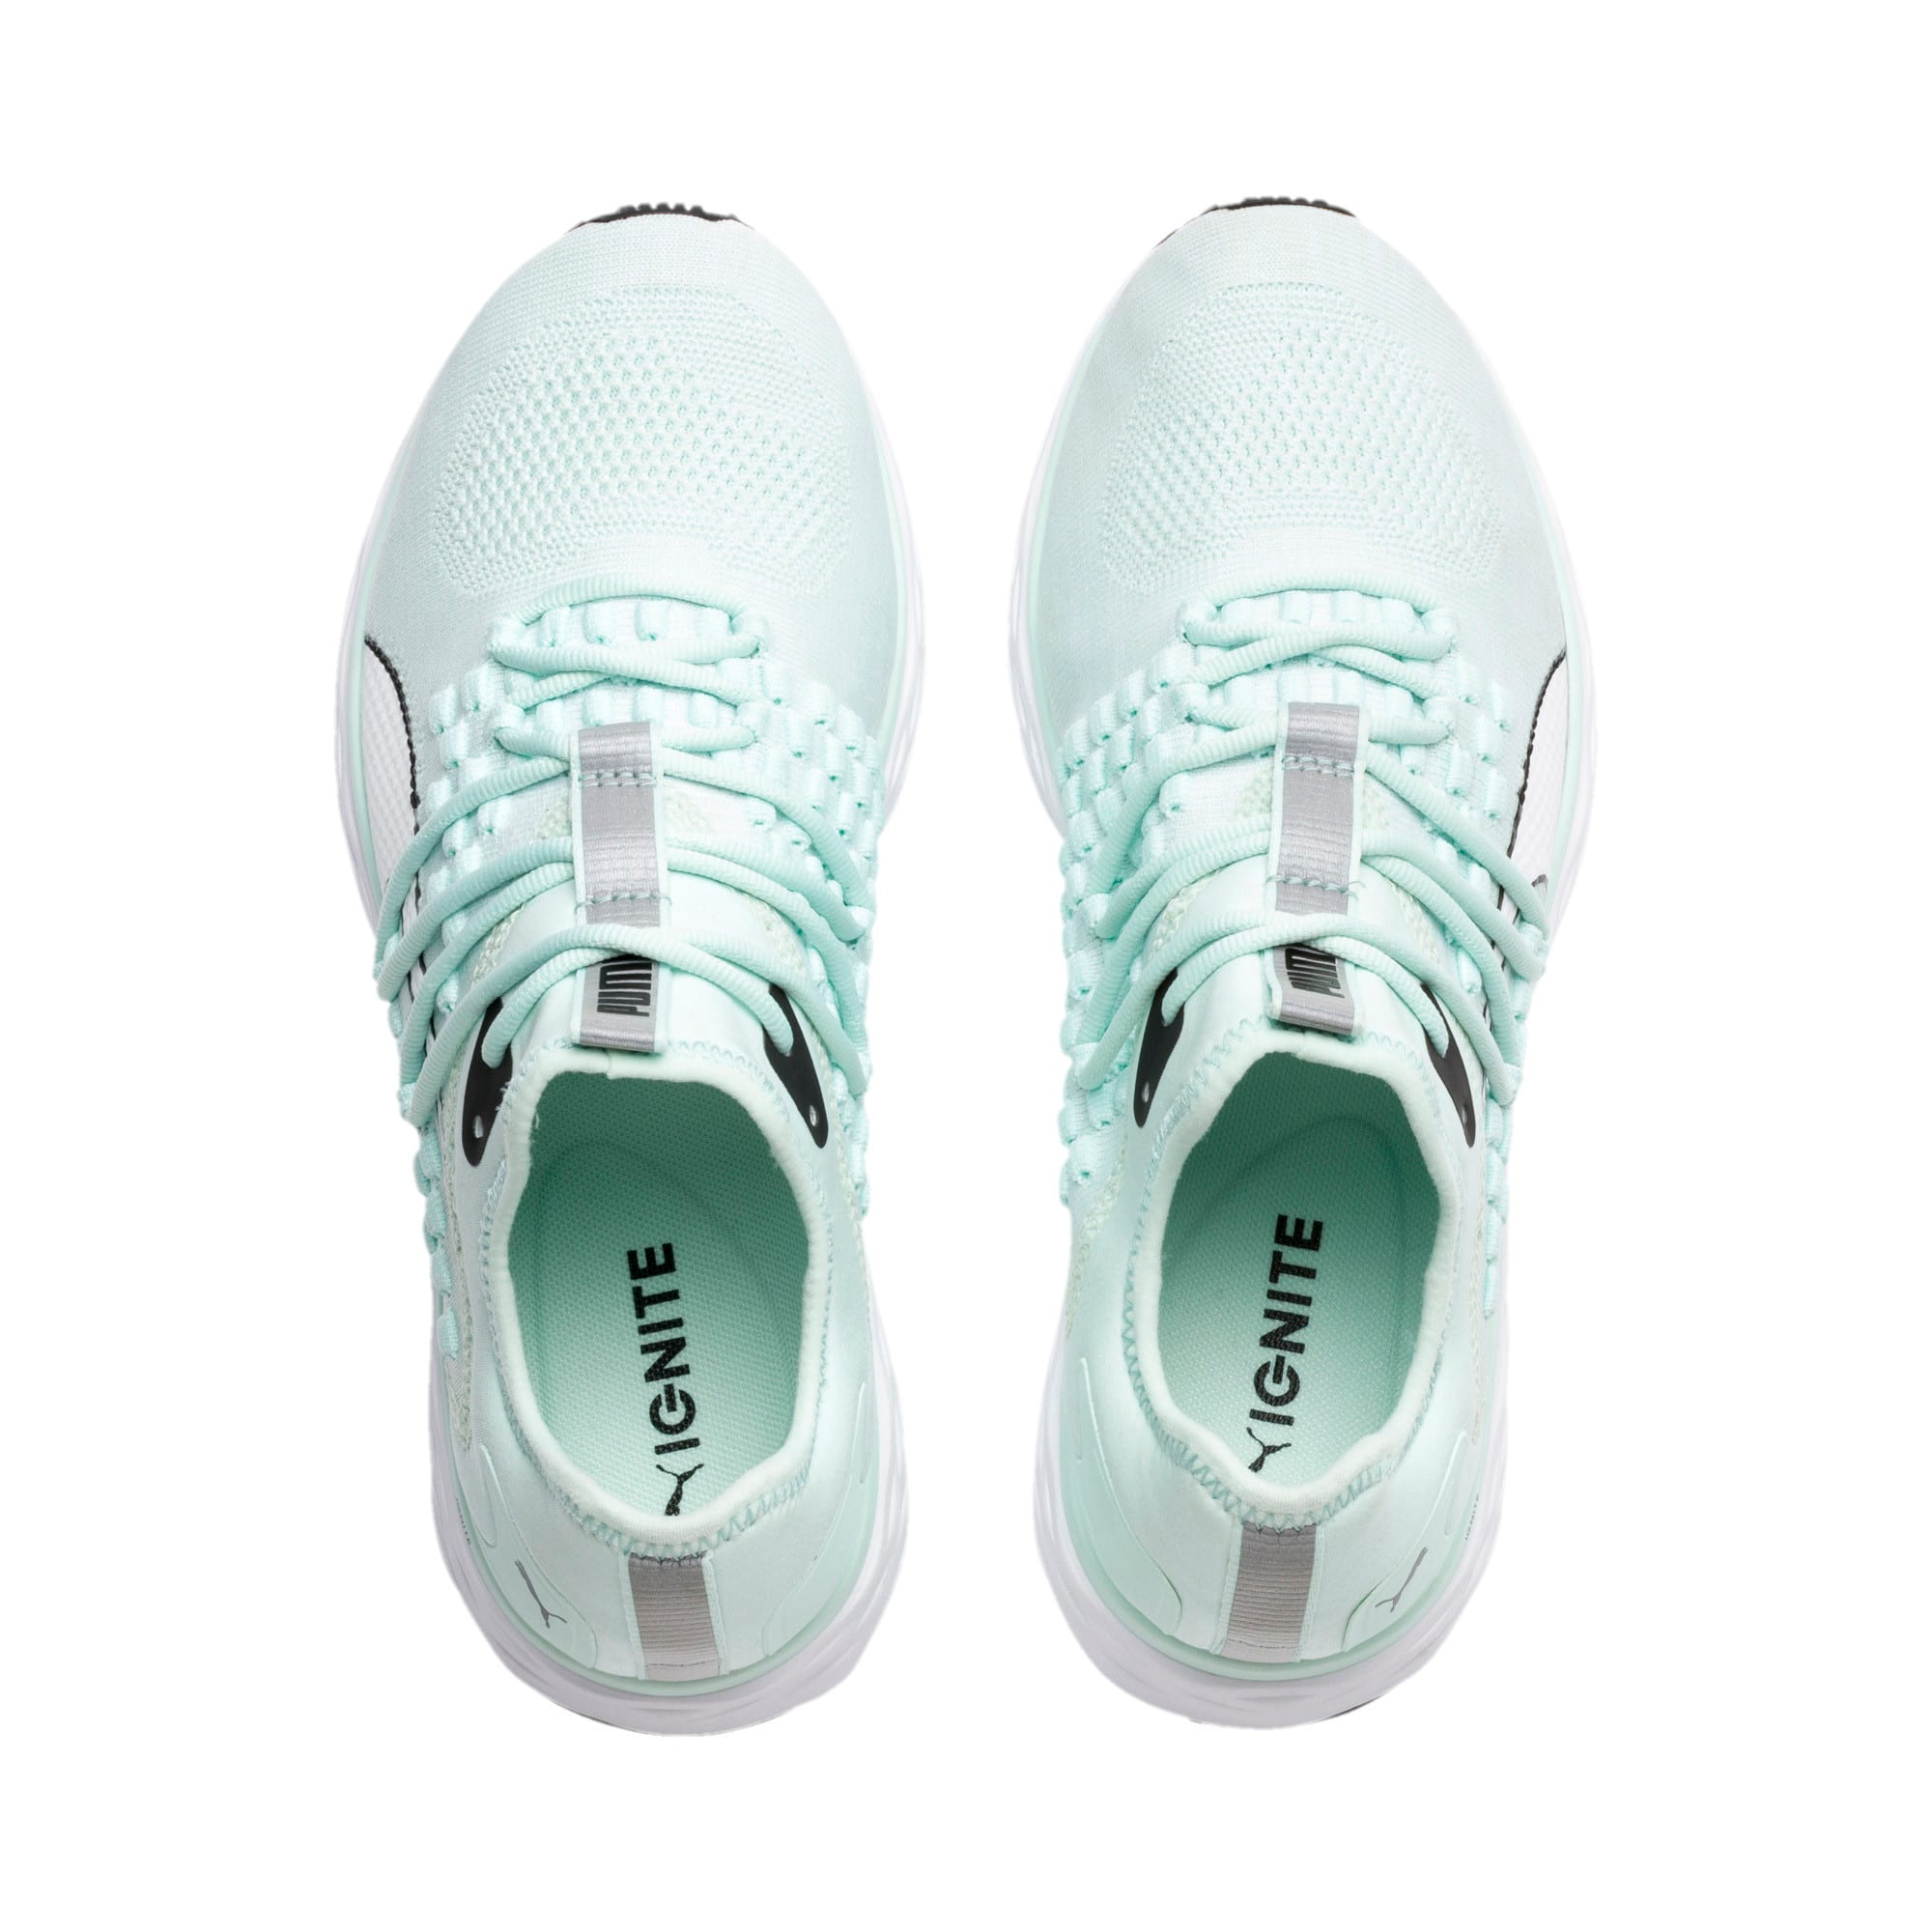 Thumbnail 5 of SPEED FUSEFIT Women's Running Shoes, Fair Aqua-Puma White, medium-IND